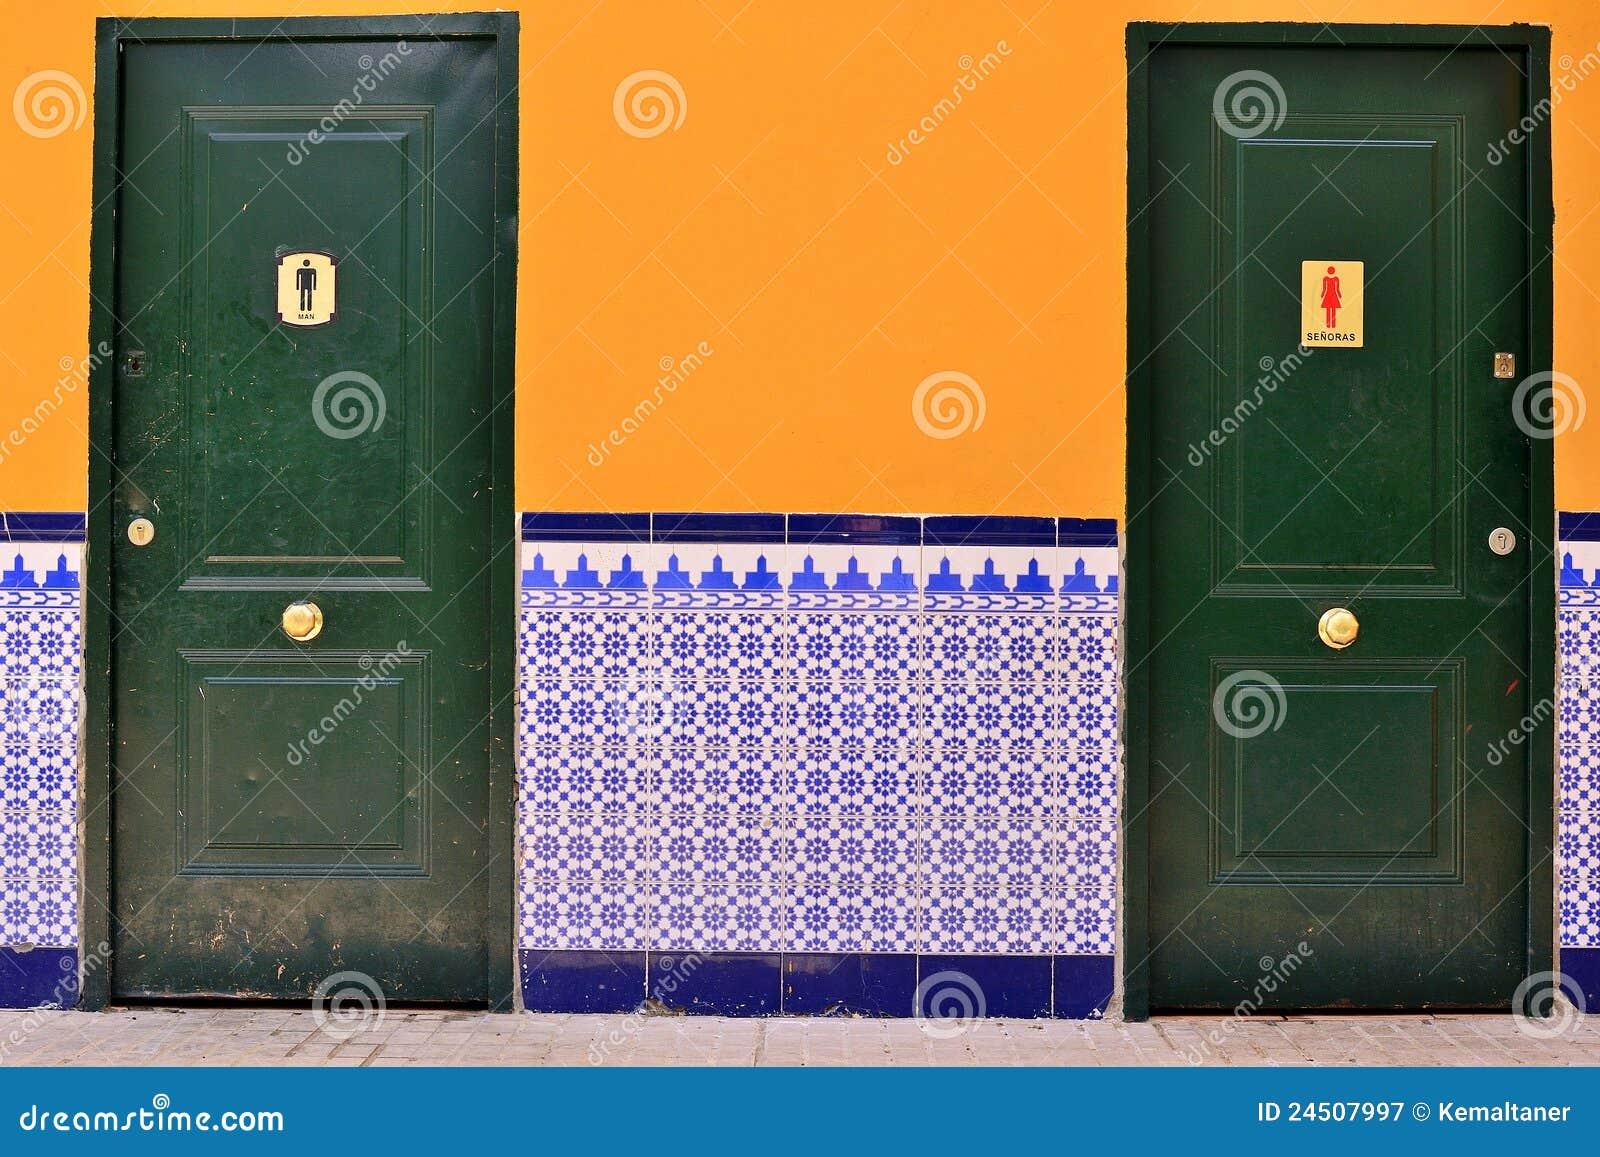 Spaanse wc met tegel stock afbeelding afbeelding bestaande uit mens 24507997 - Wc muur tegel ...